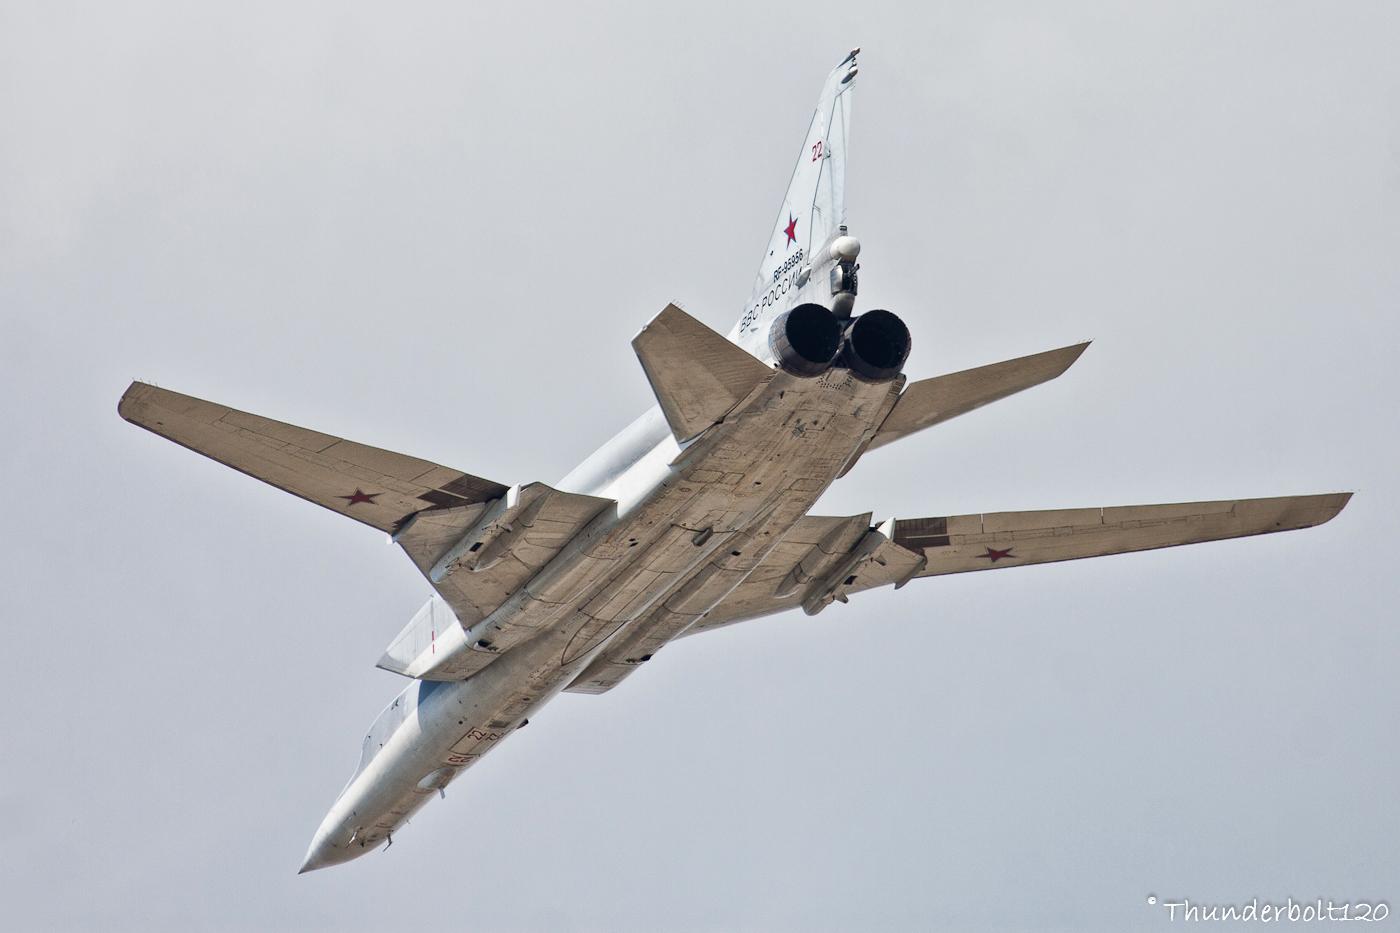 Tupolev Tu-22M-3 Backfire RF-95956